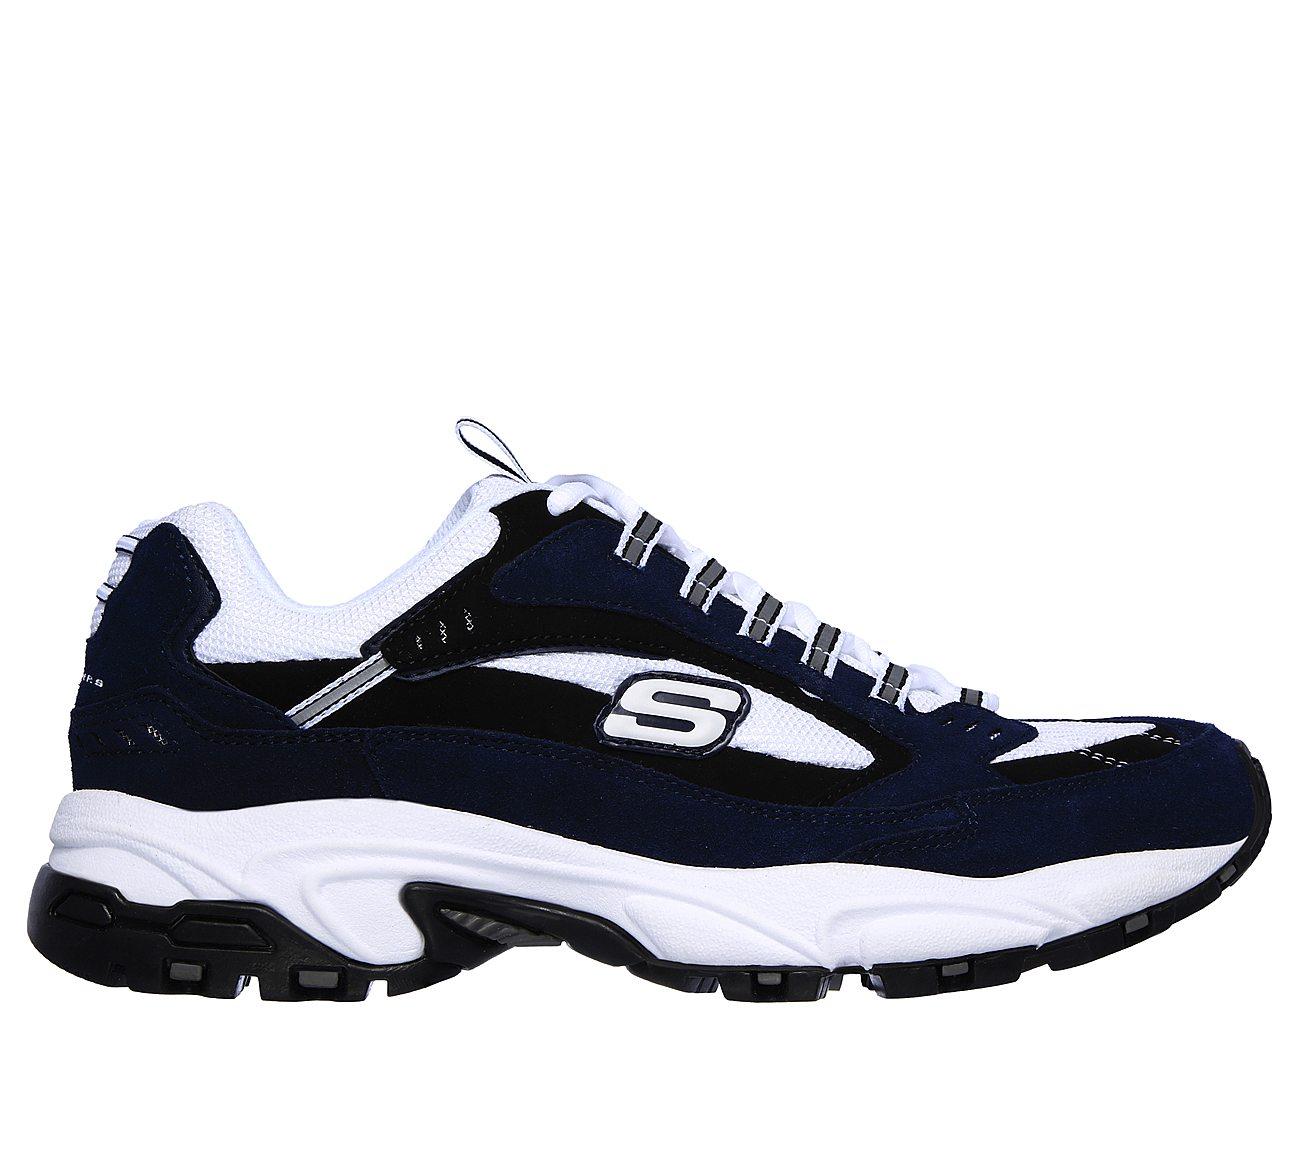 Buy SKECHERS Stamina - Cutback Sport Shoes